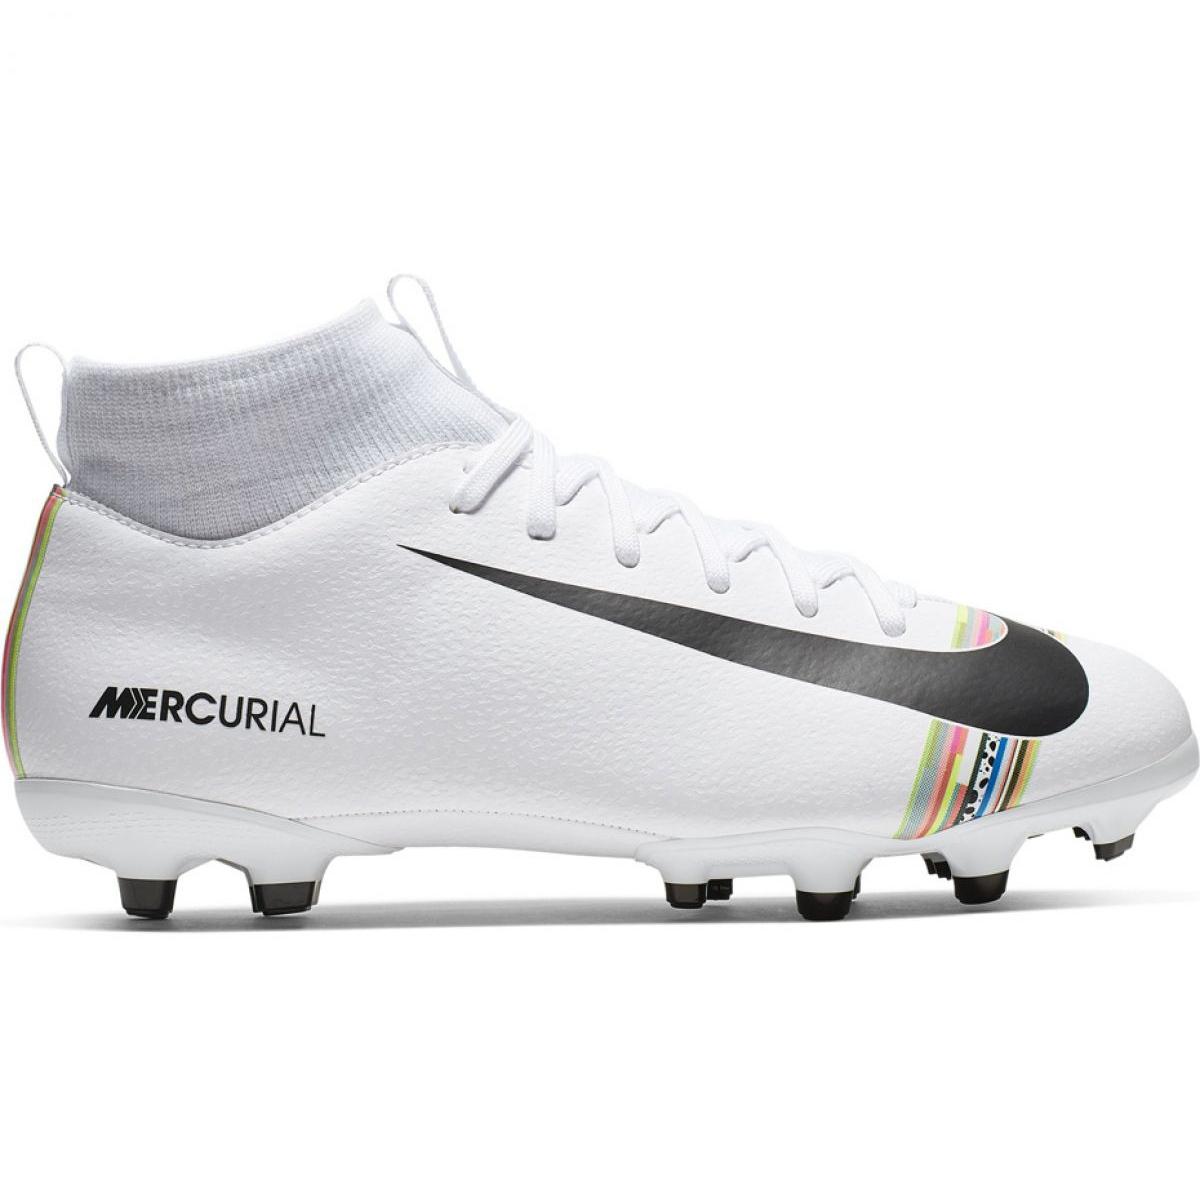 low priced 55d0c 5dd49 Football shoes Nike Mercurial Superfly 6 Academy Mg Jr AJ3111-109